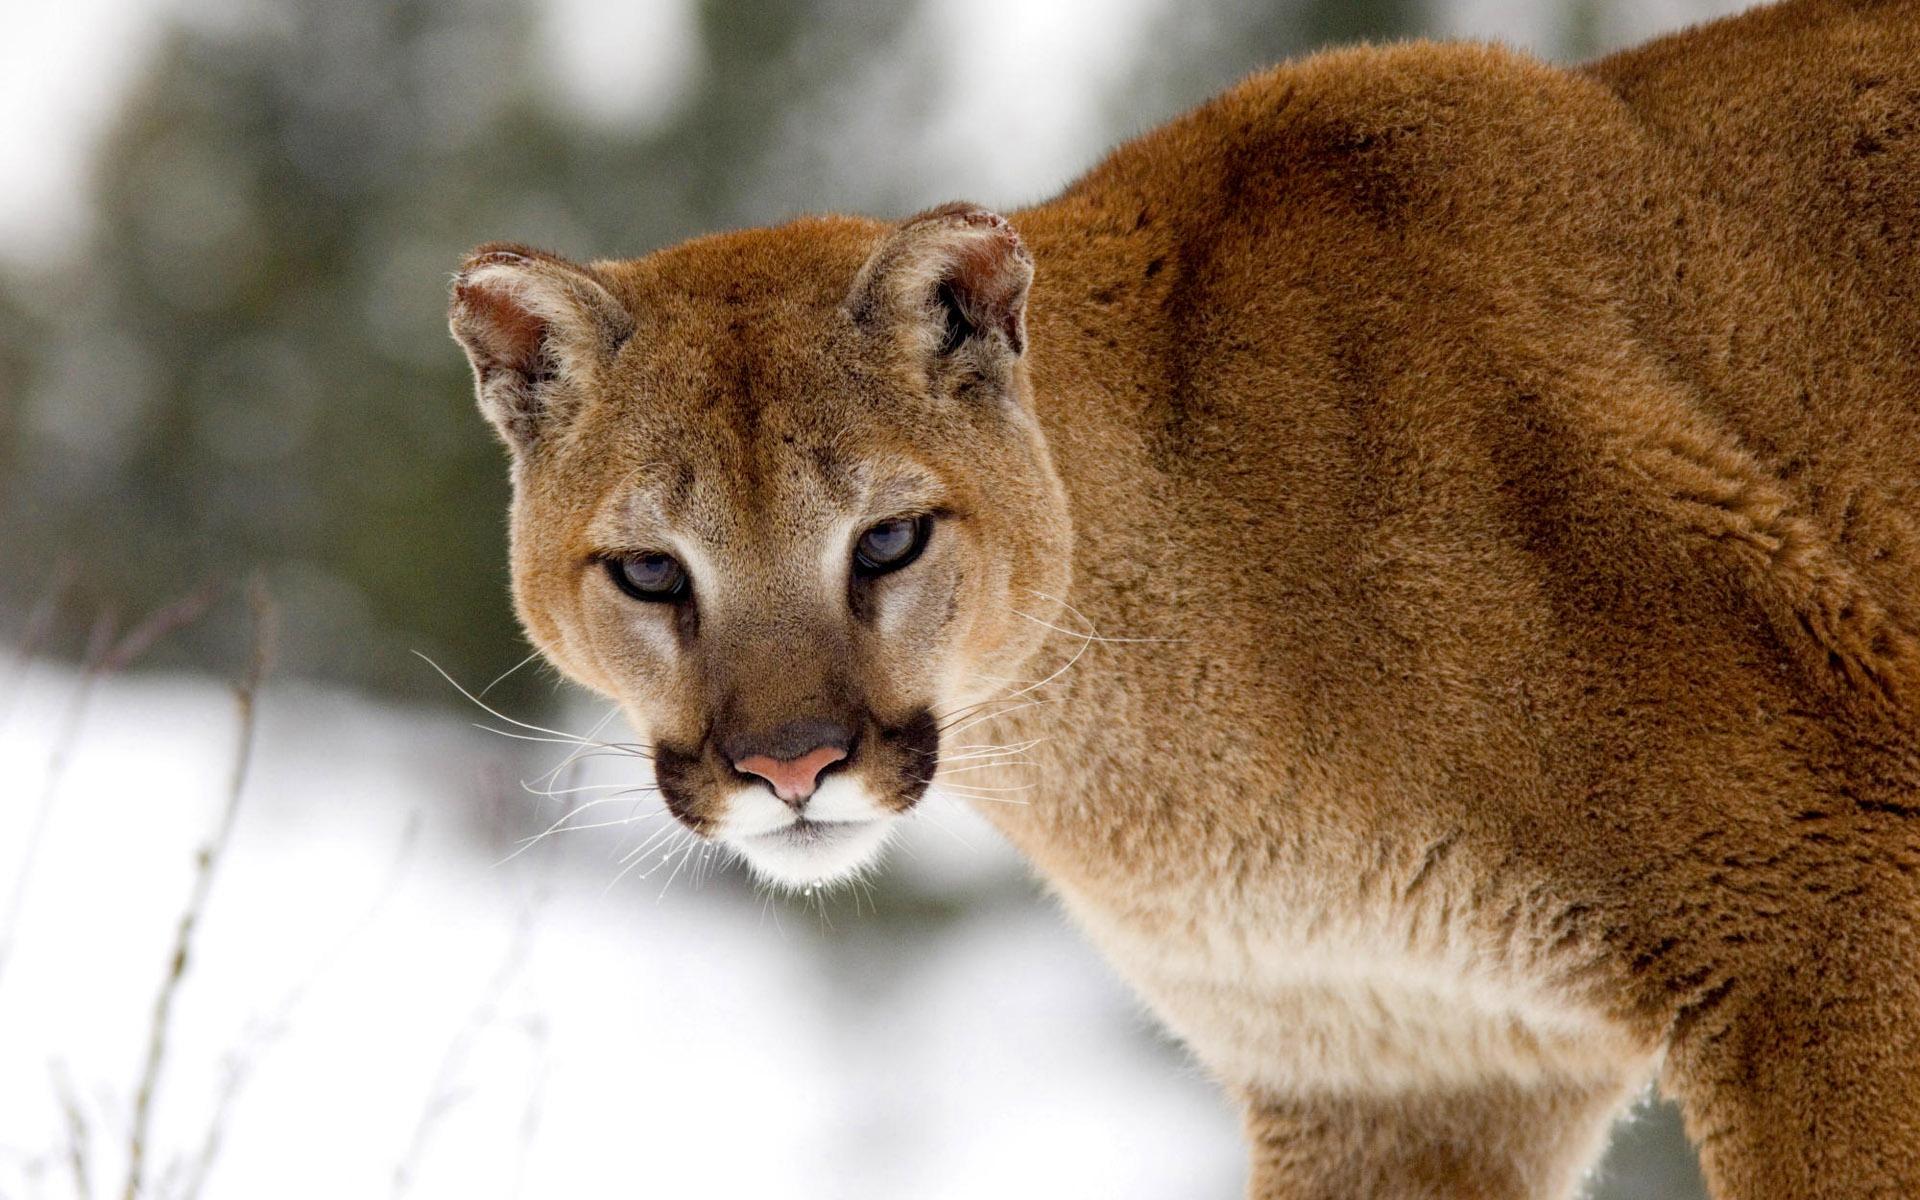 Download 1920x1200 Wallpaper Wild Cat, Predator, Cougar, Ani